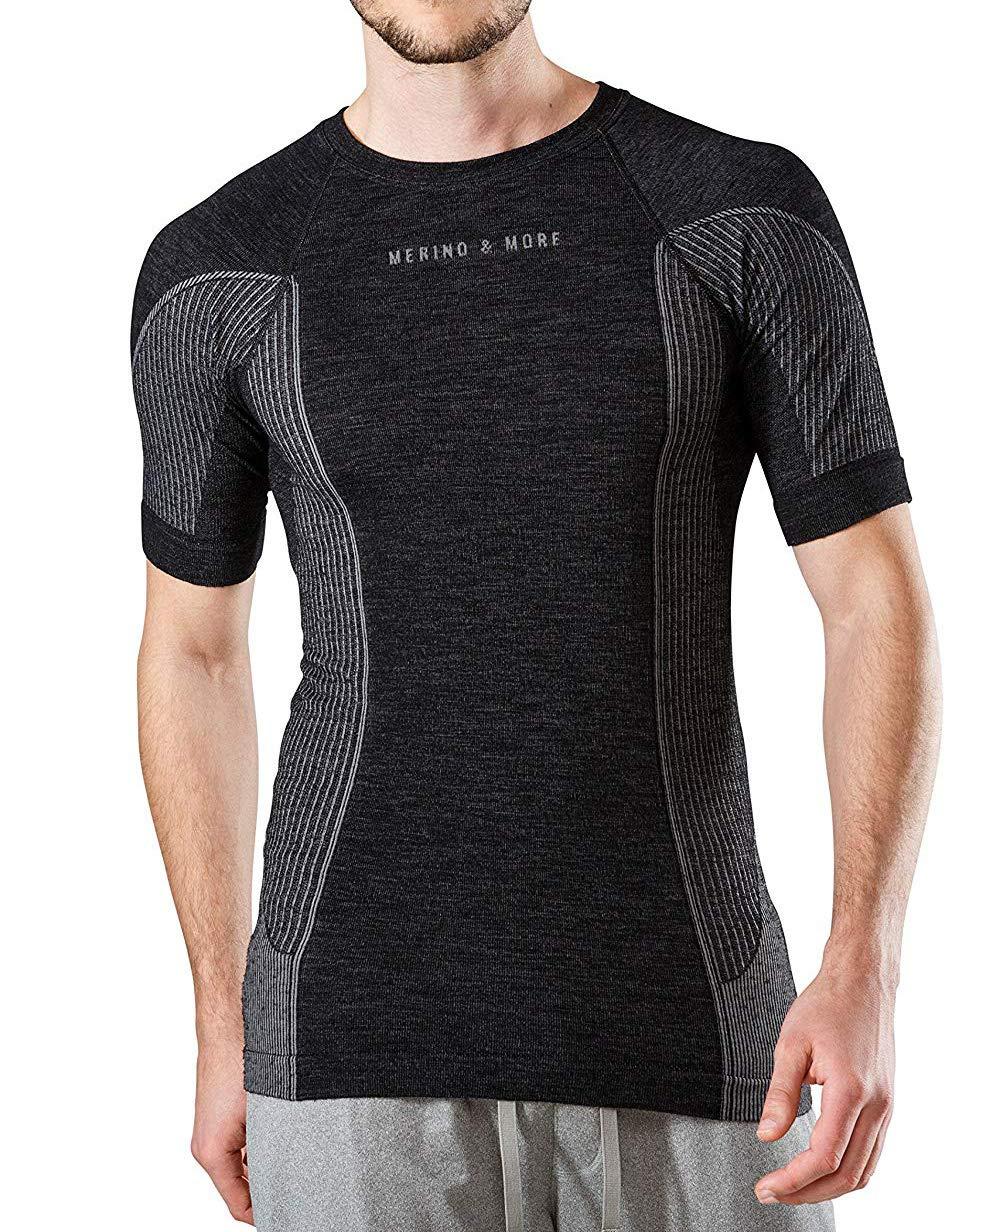 Merino & More Herren Funktions T-Shirt Merinowolle - Funktionsunterwäsche Kurzarm